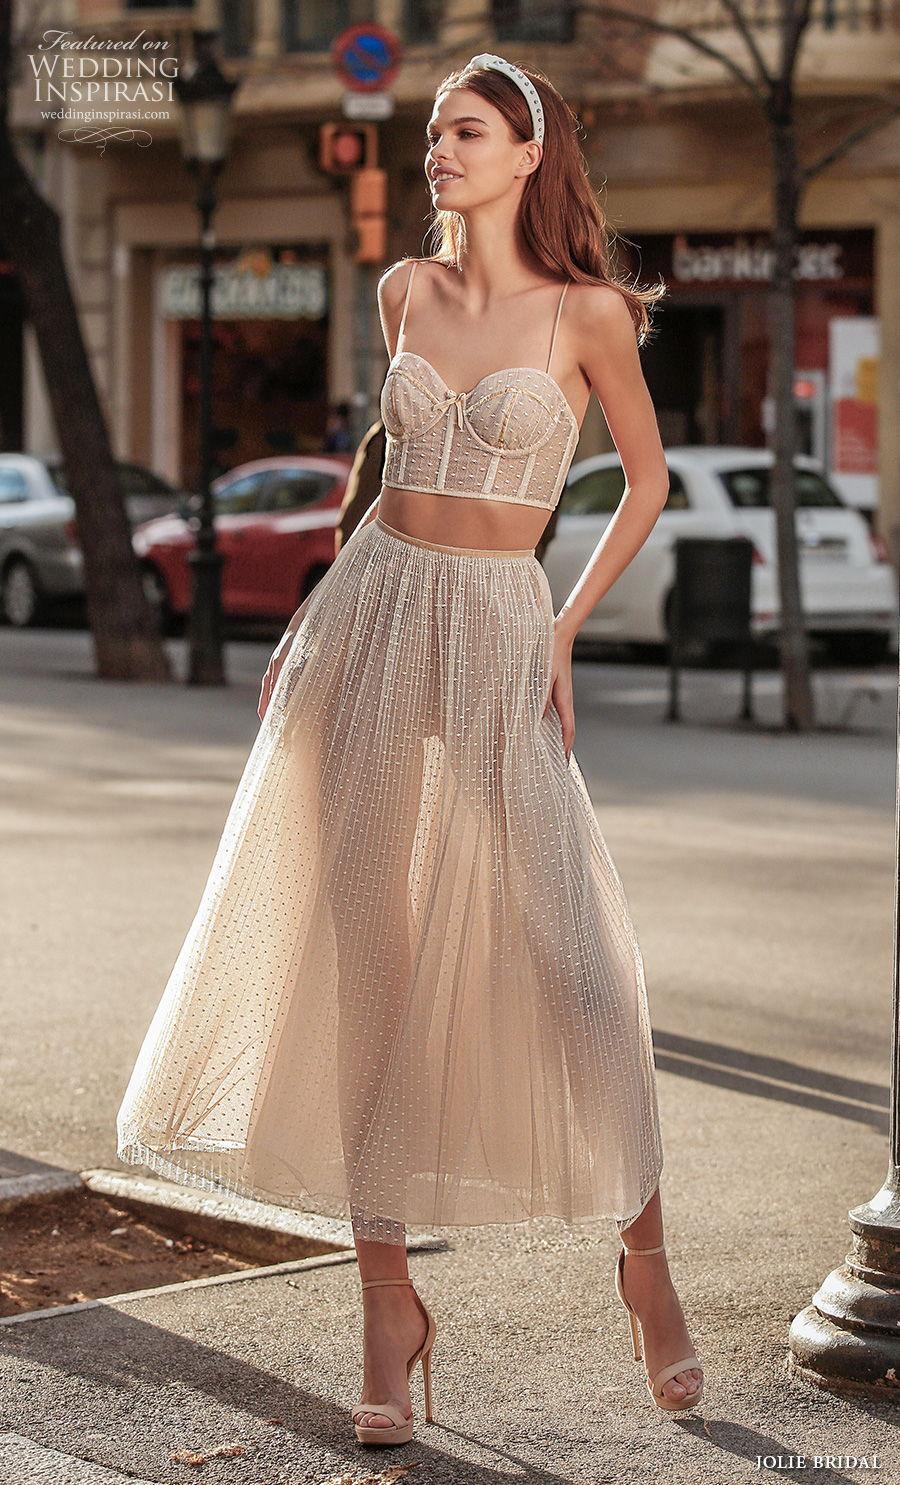 jolie spring 2021 bridal sleeveless spaghetti strap sweetheart neckline bustier crop top 2 piece romantic tea ivory length short wedding dress (7) mv